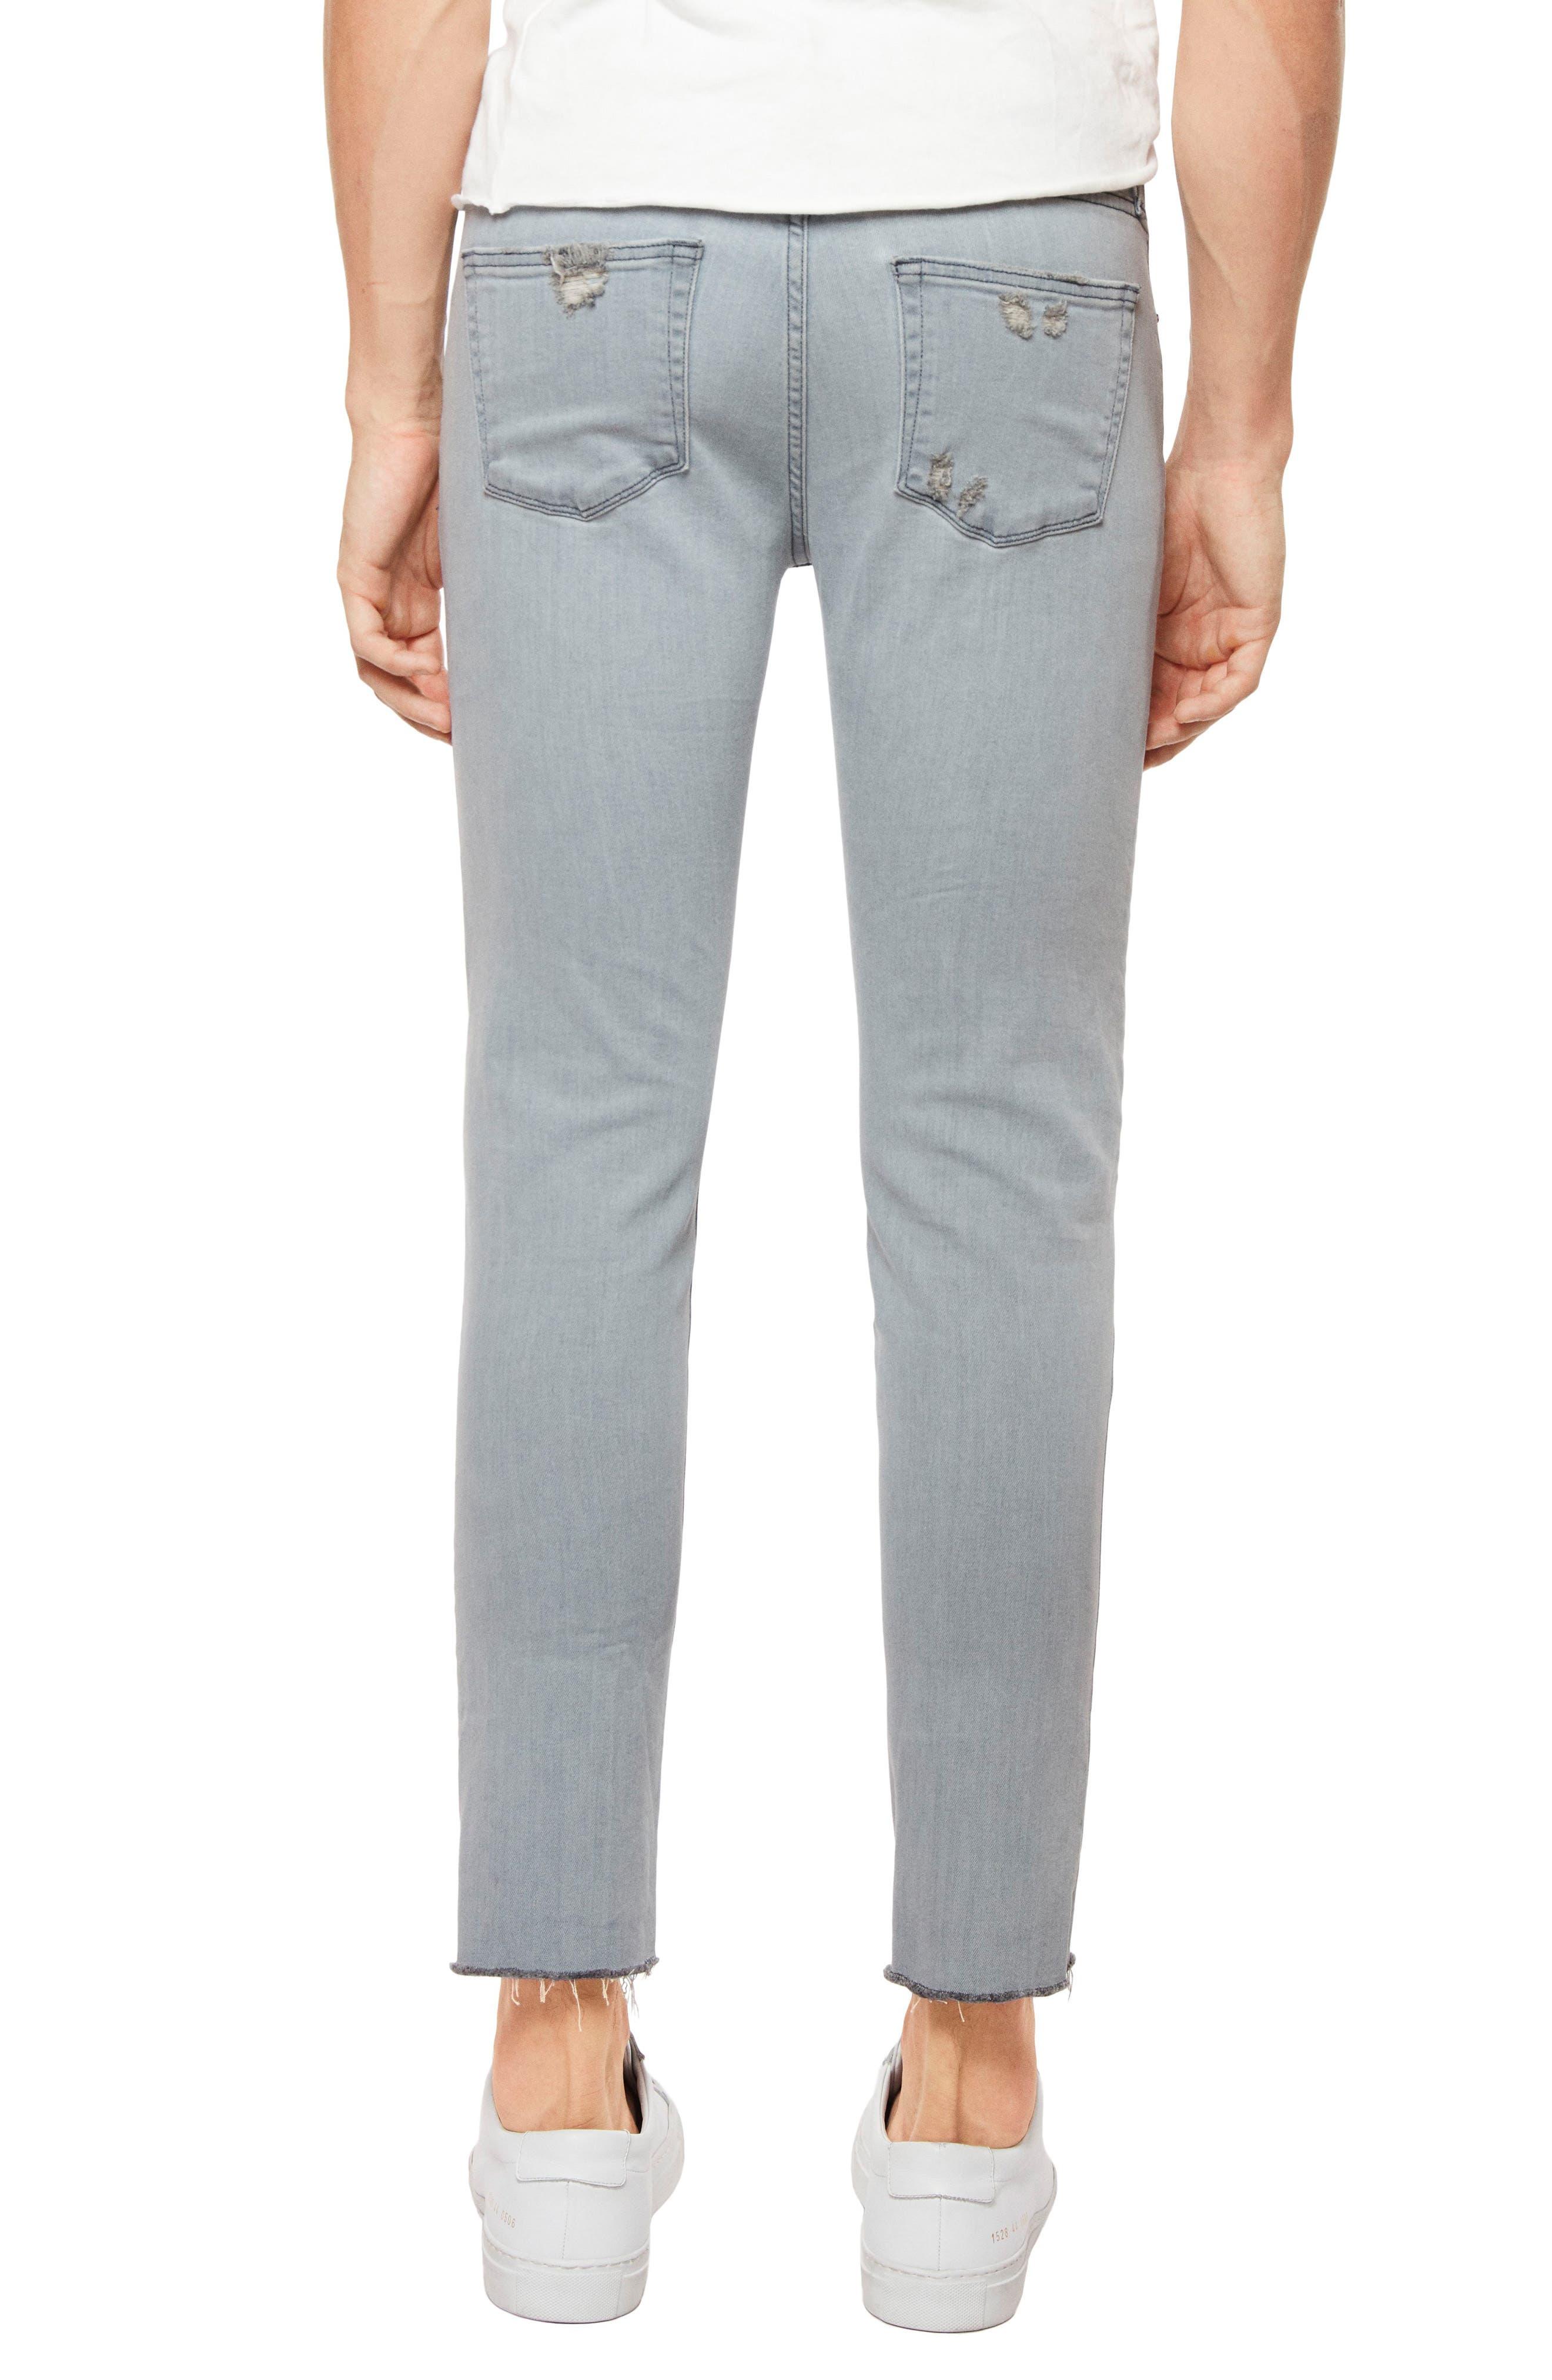 Tyler Slim Fit Jeans,                             Alternate thumbnail 2, color,                             Trounced Porpoise